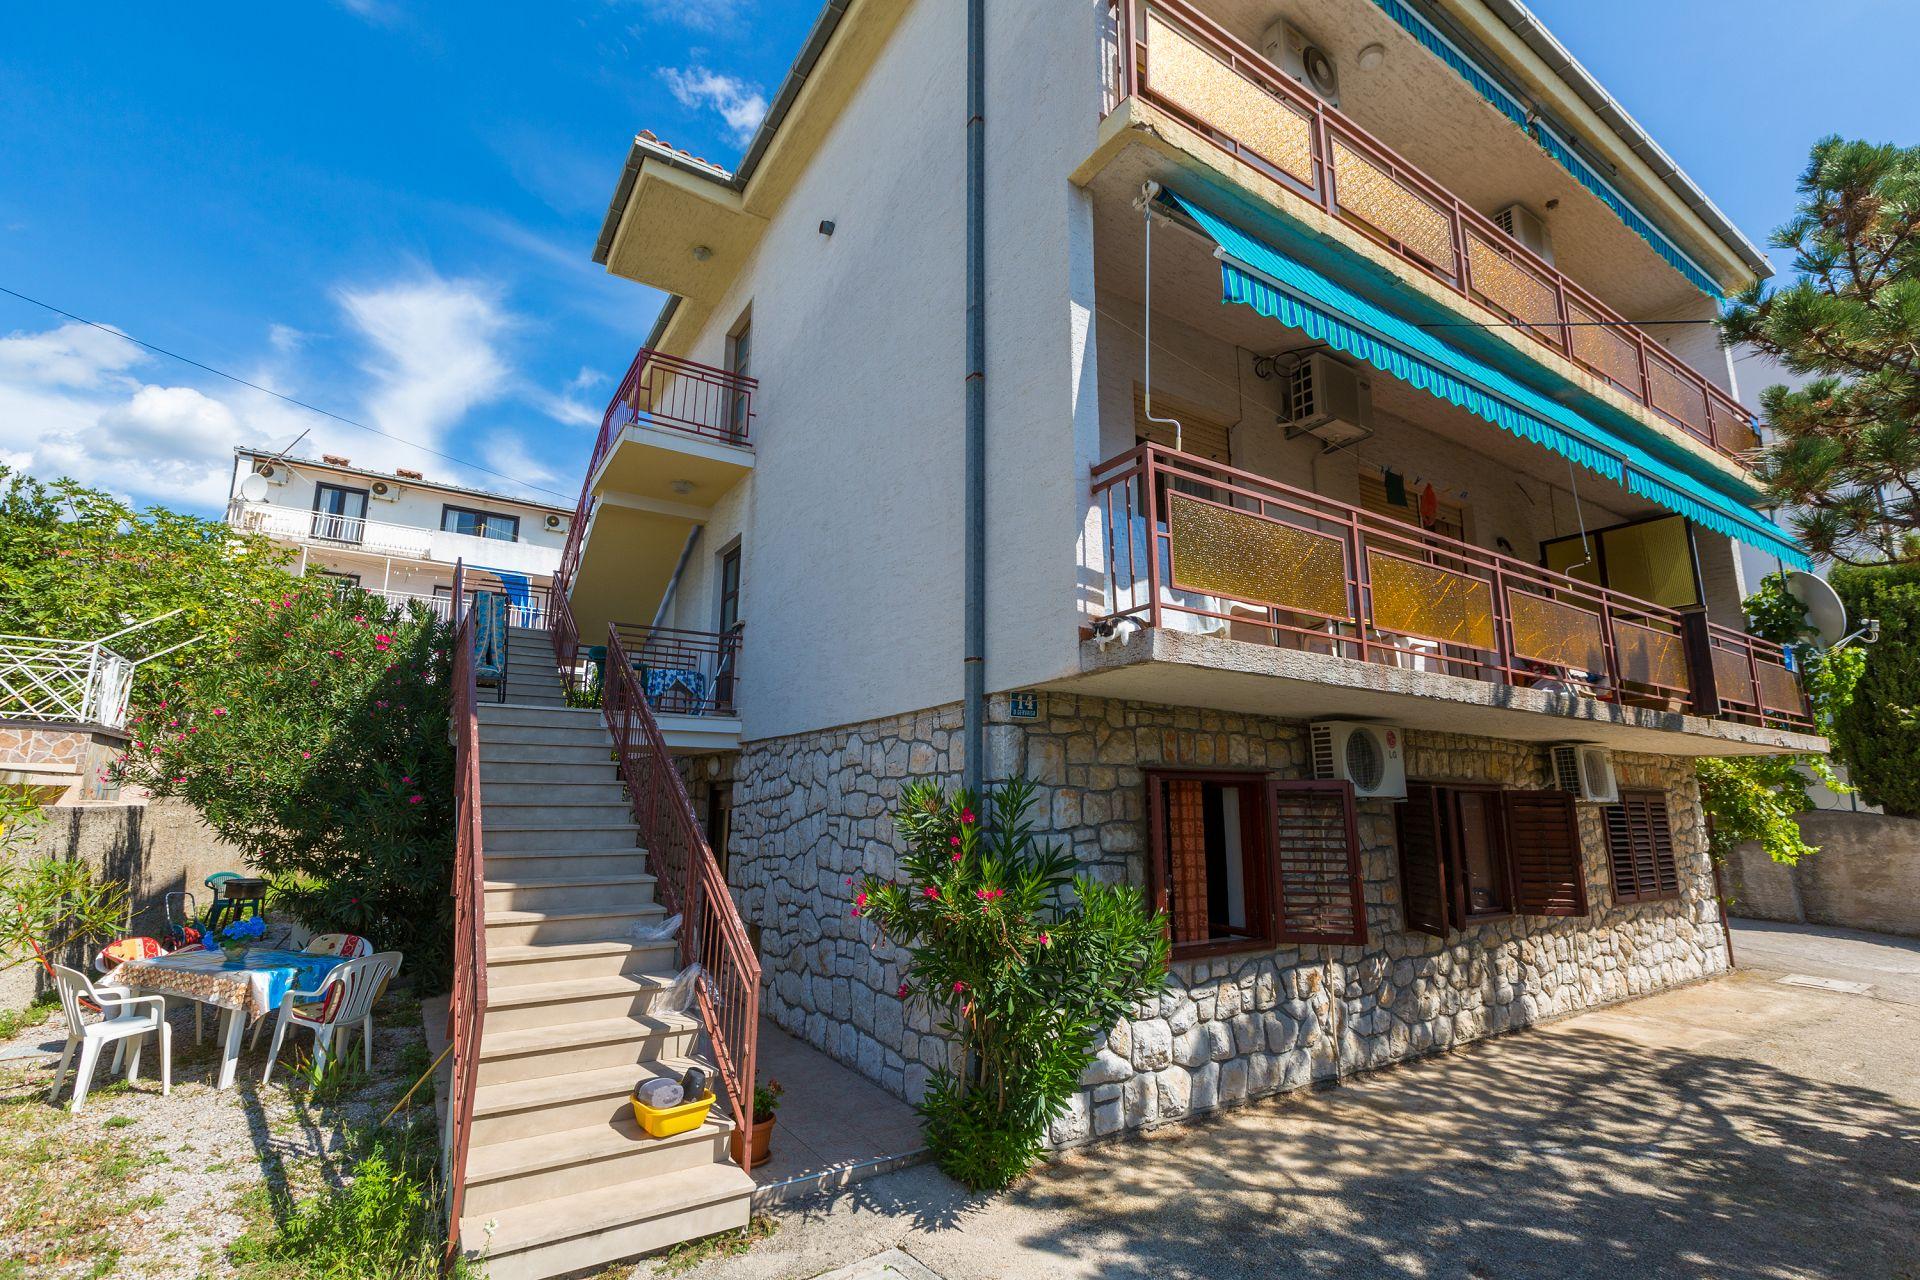 36271 - Crikvenica - Appartementen Kroatië